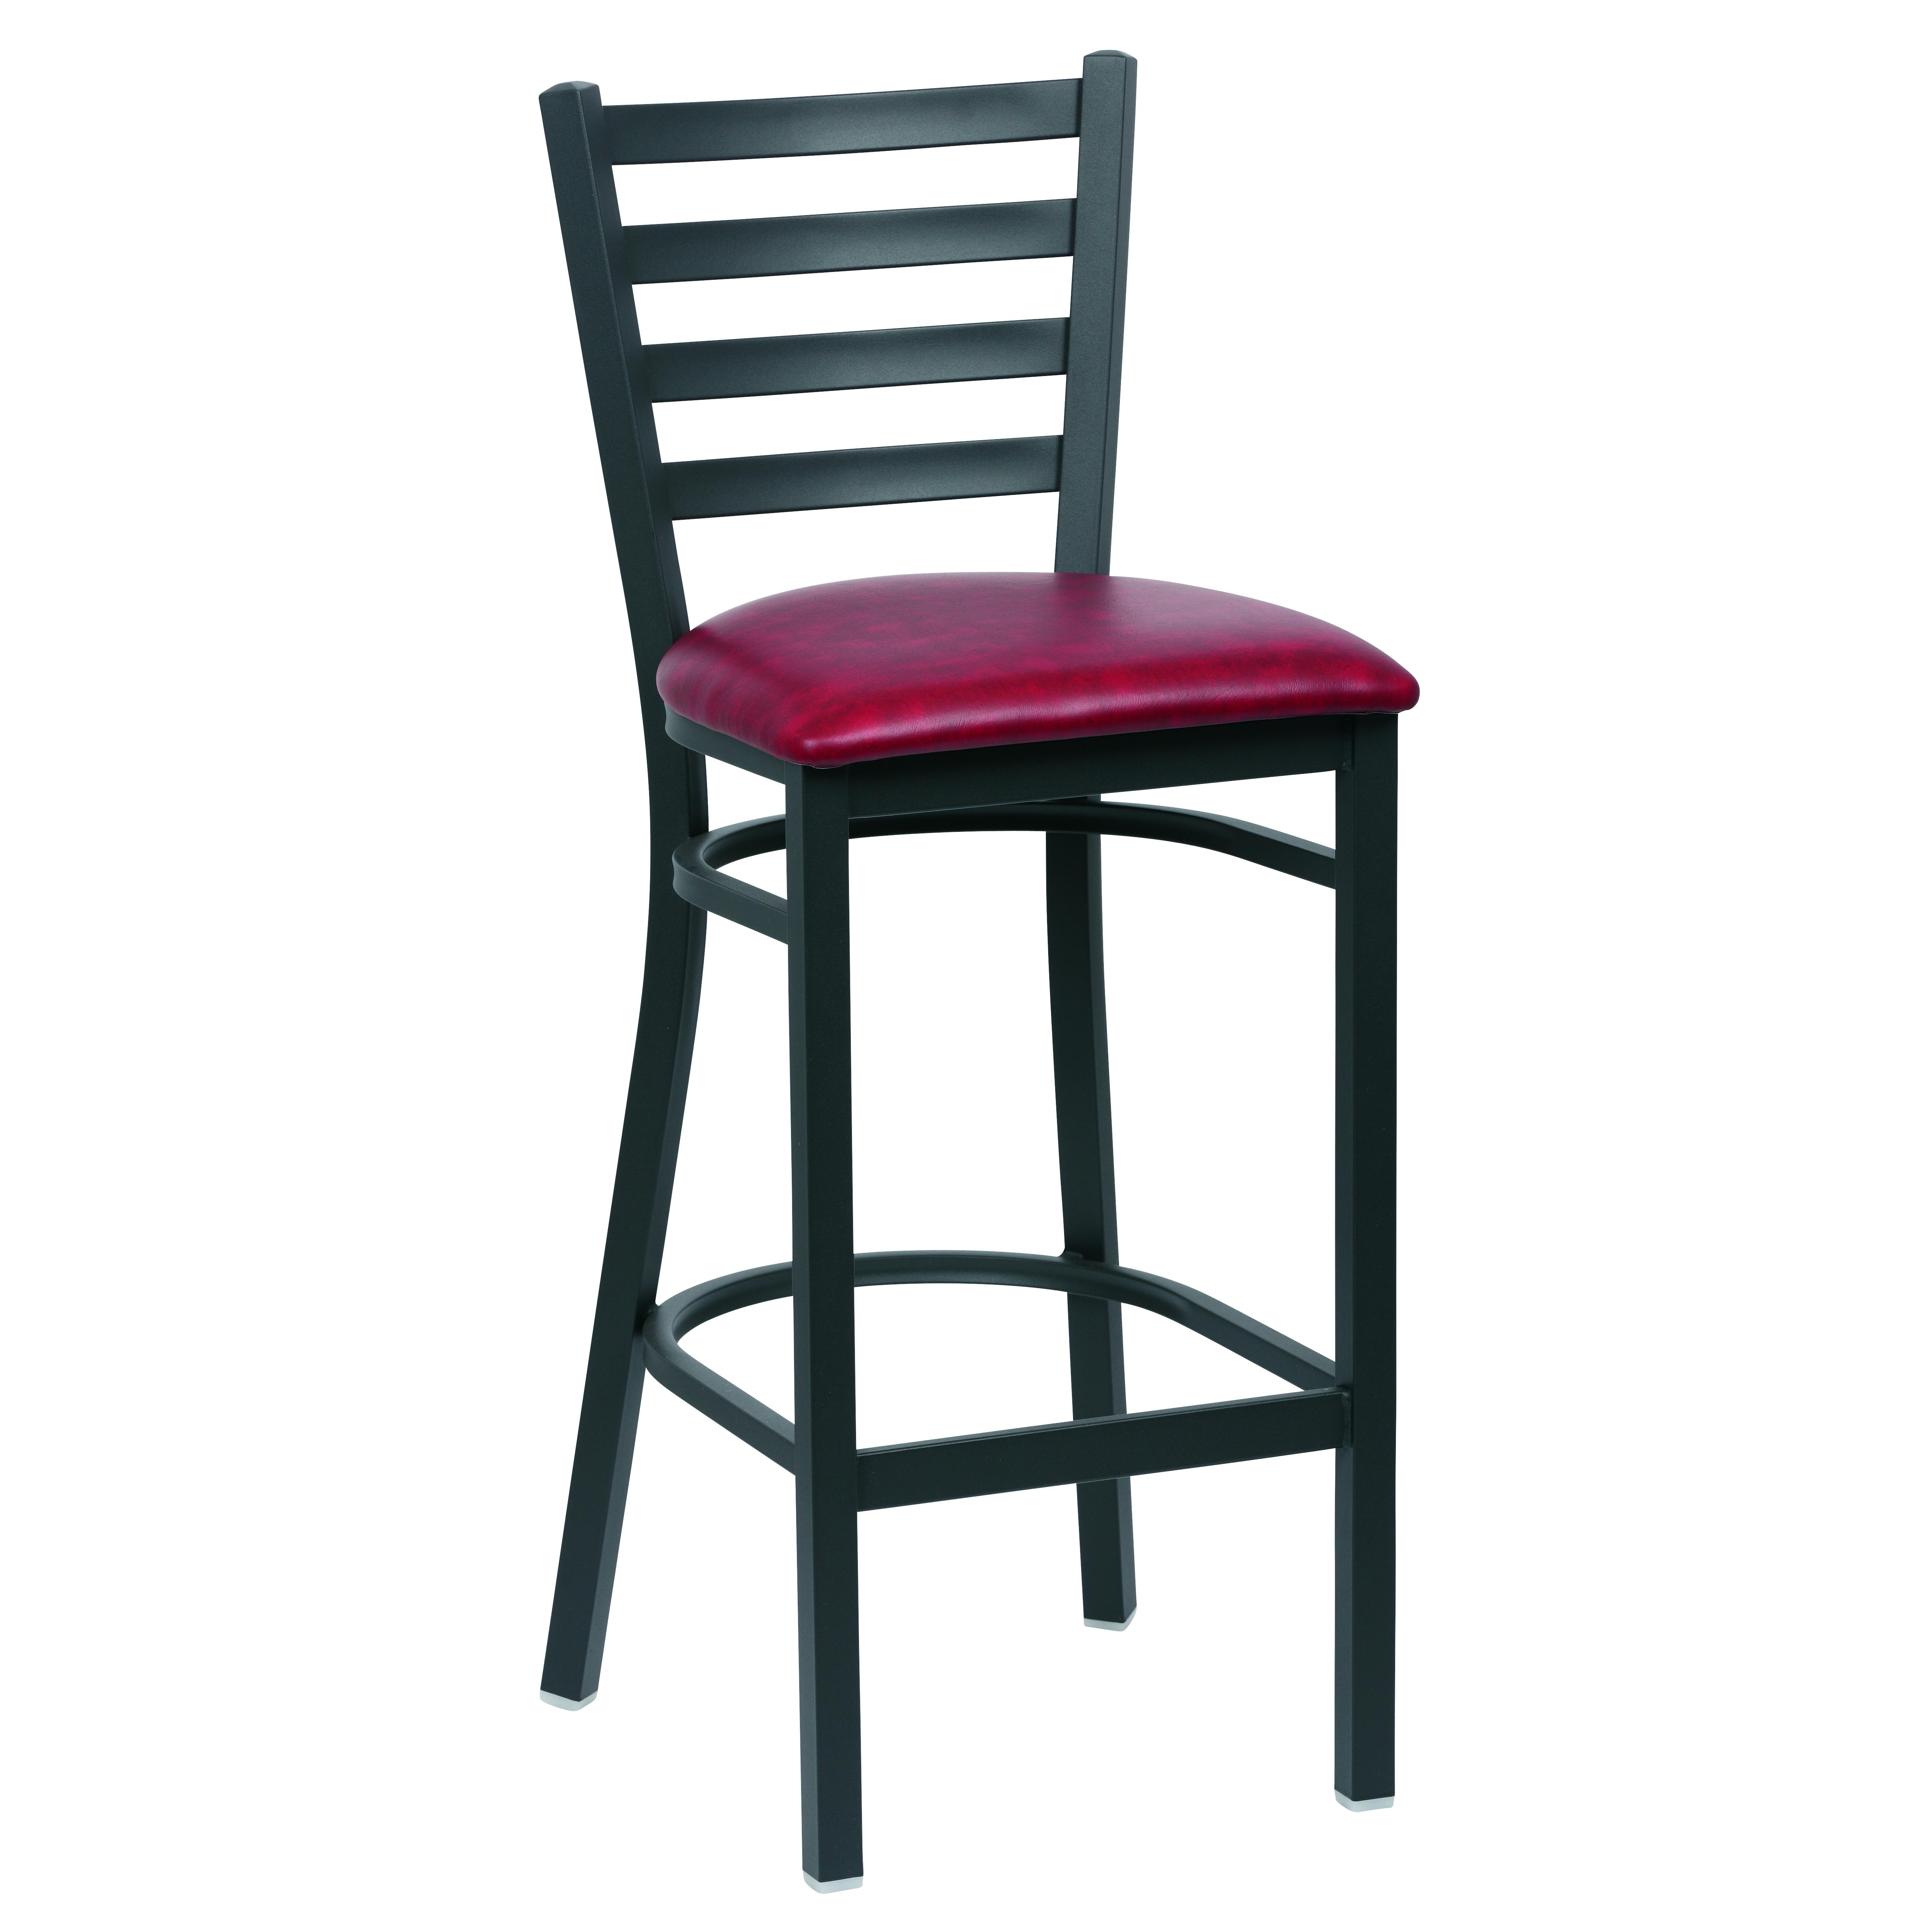 Royal Industries ROY 9002 CRM bar stool, indoor